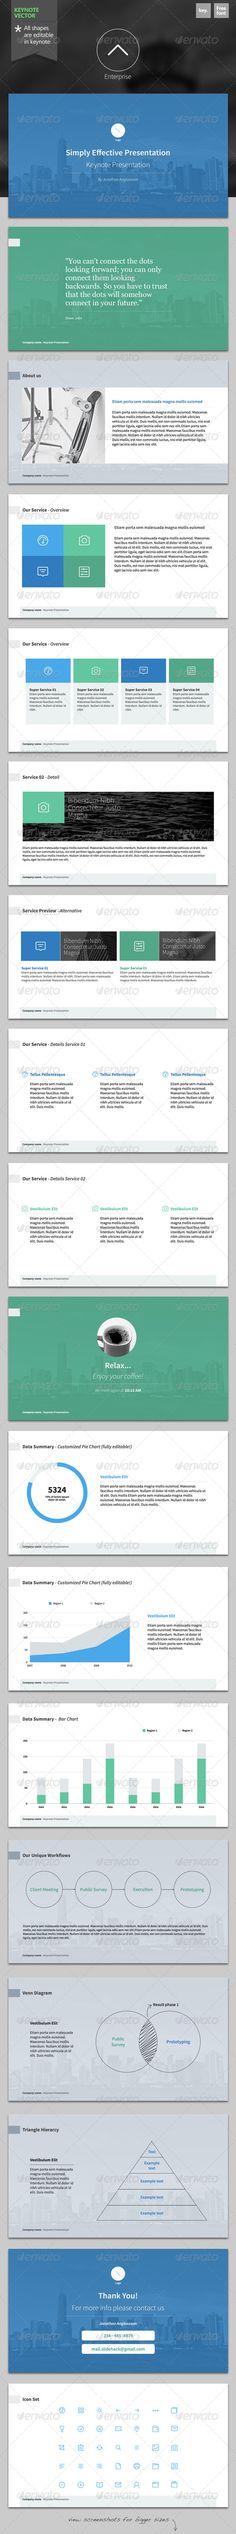 Presentation Templates - Enterprise - Keynote Template   GraphicRiver, presentation, design,